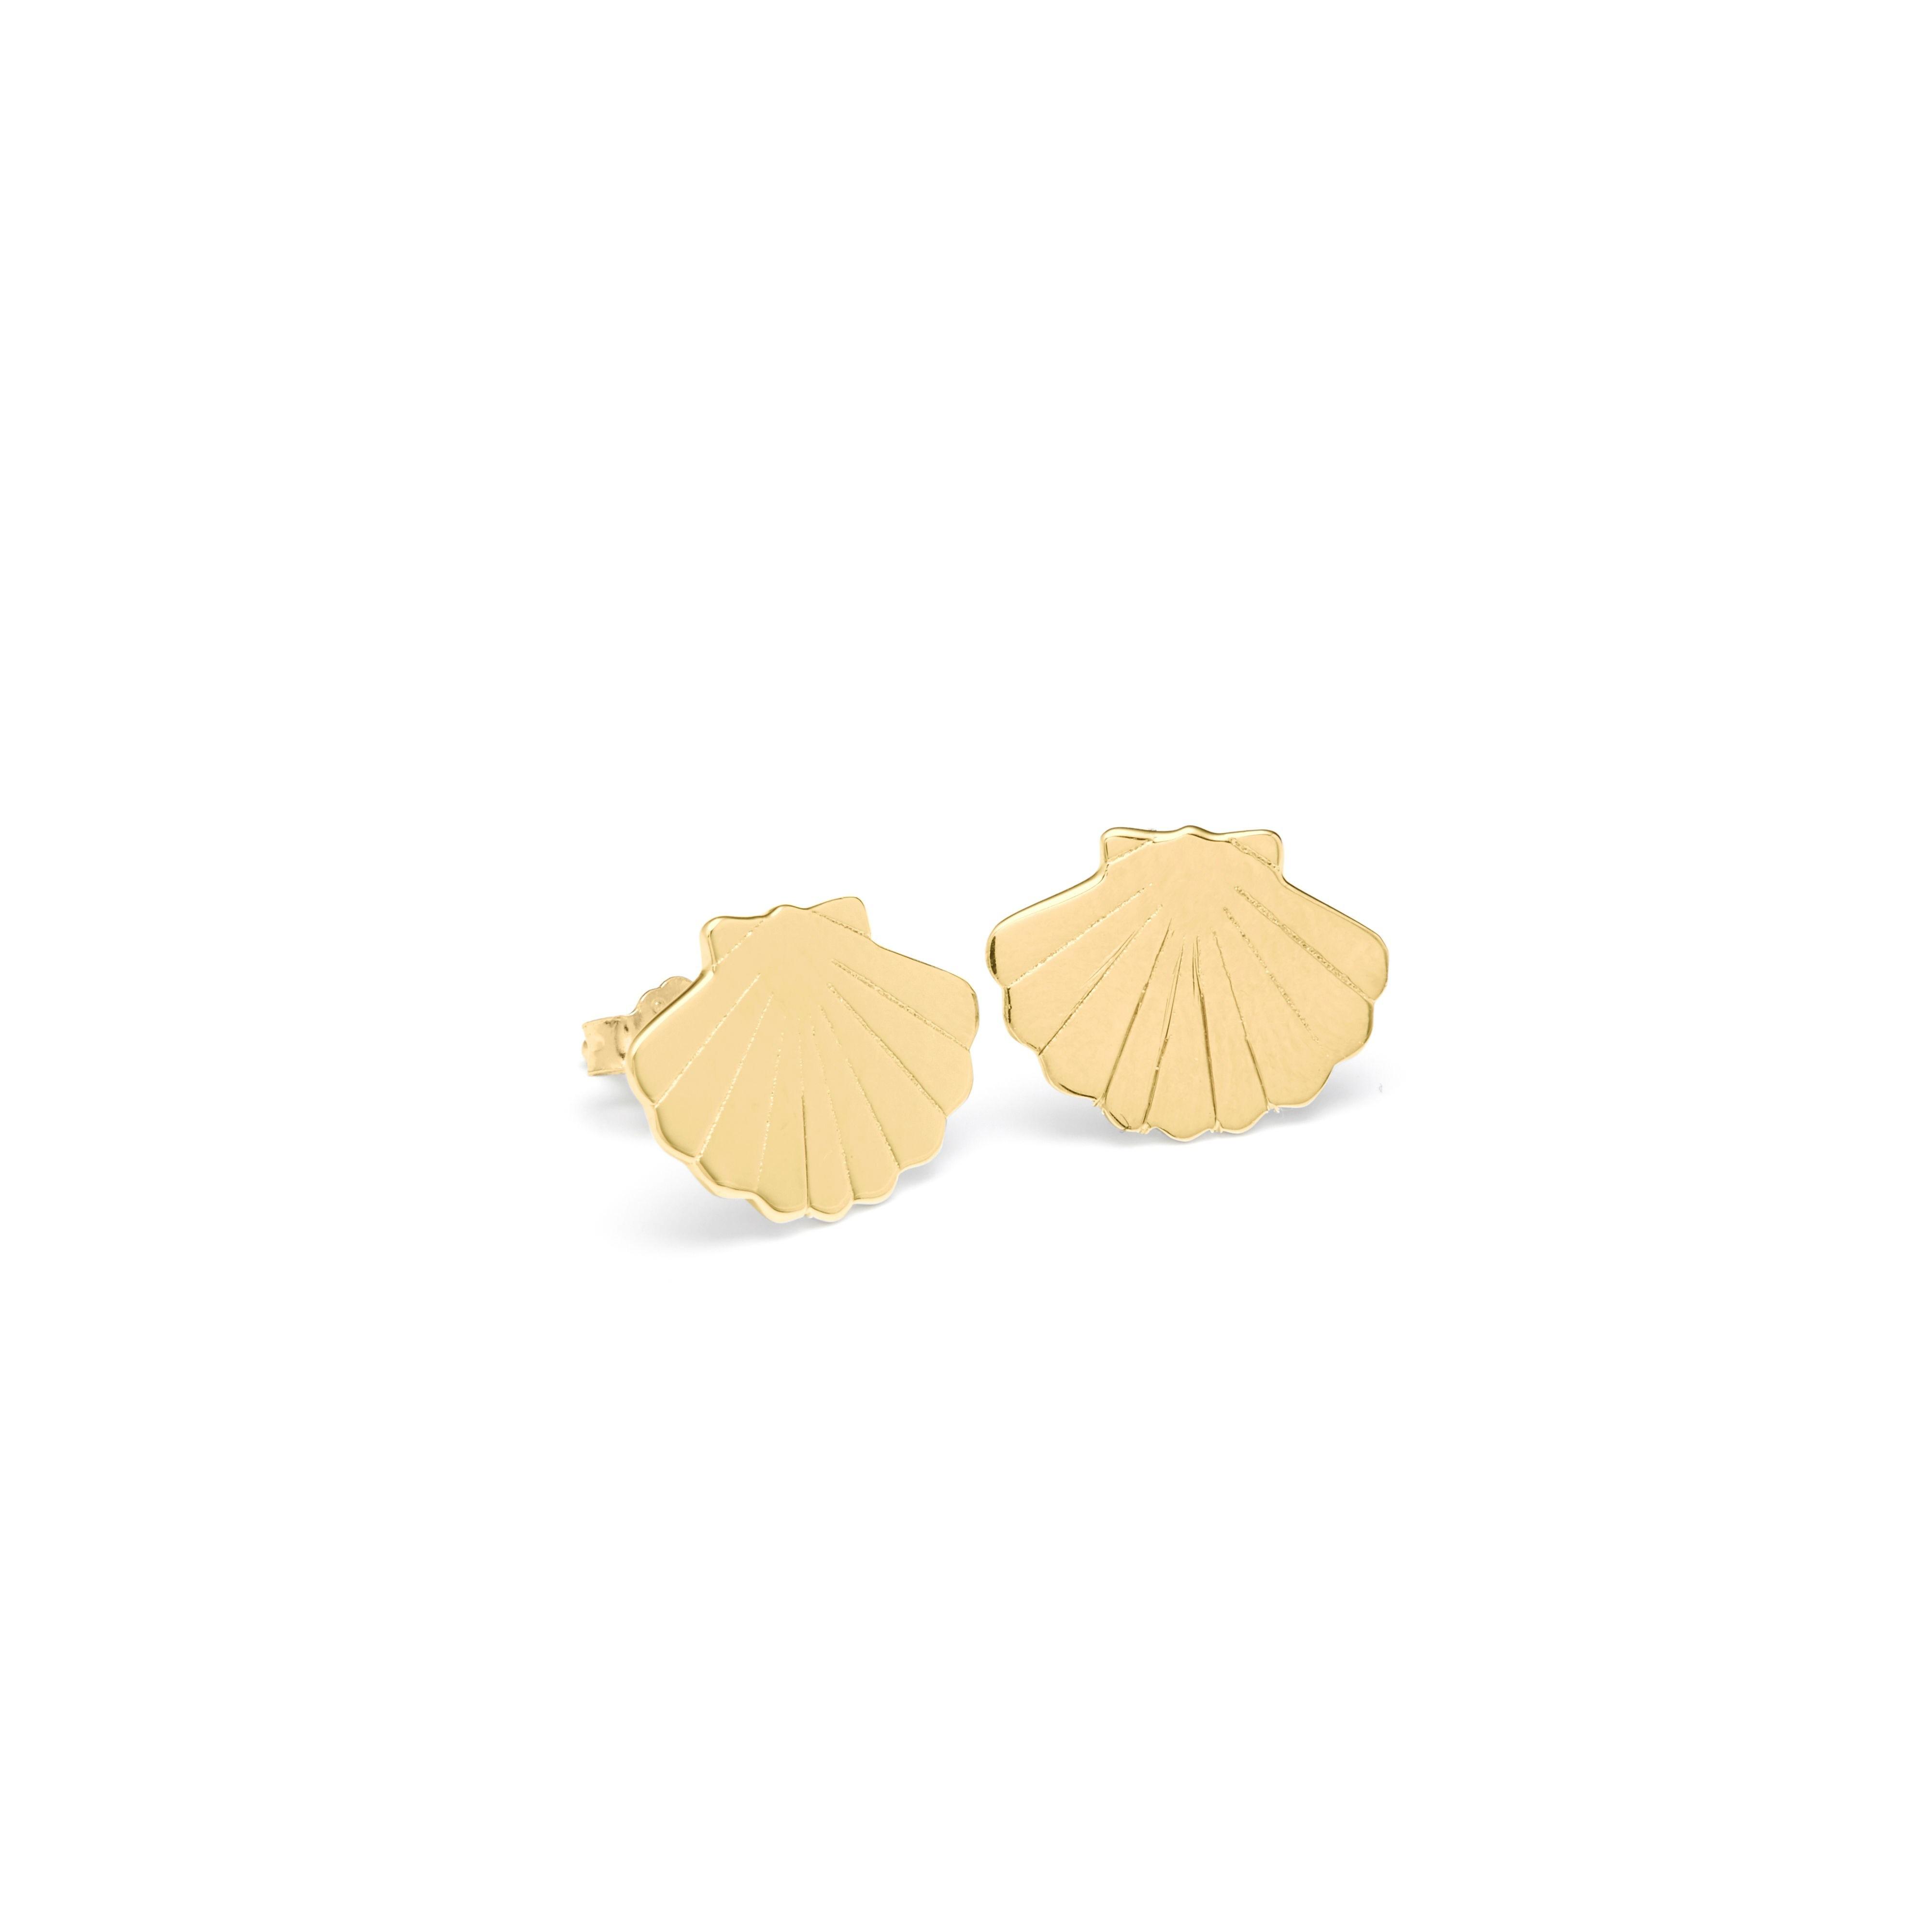 https://www.selecteddesigners.dk/media/catalog/product/h/a/hangon_03-01_ocean_gold.jpg